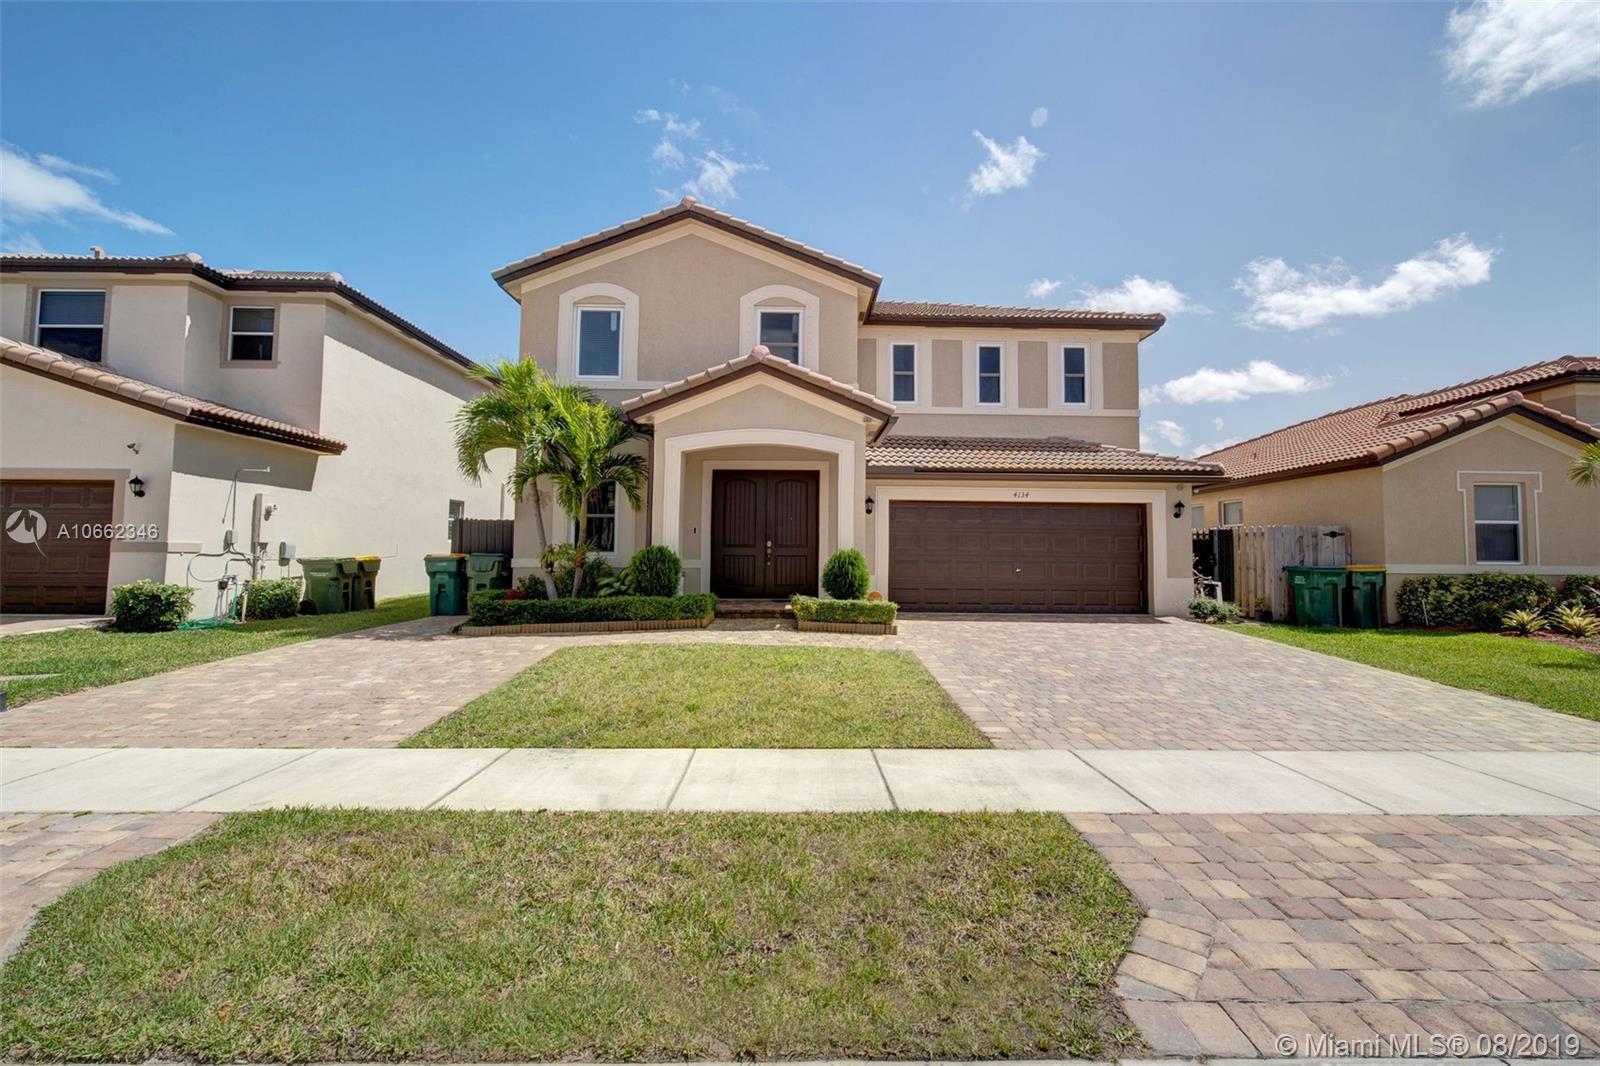 4134 NE 21 Court, Homestead, FL 33033 - Homestead, FL real estate listing